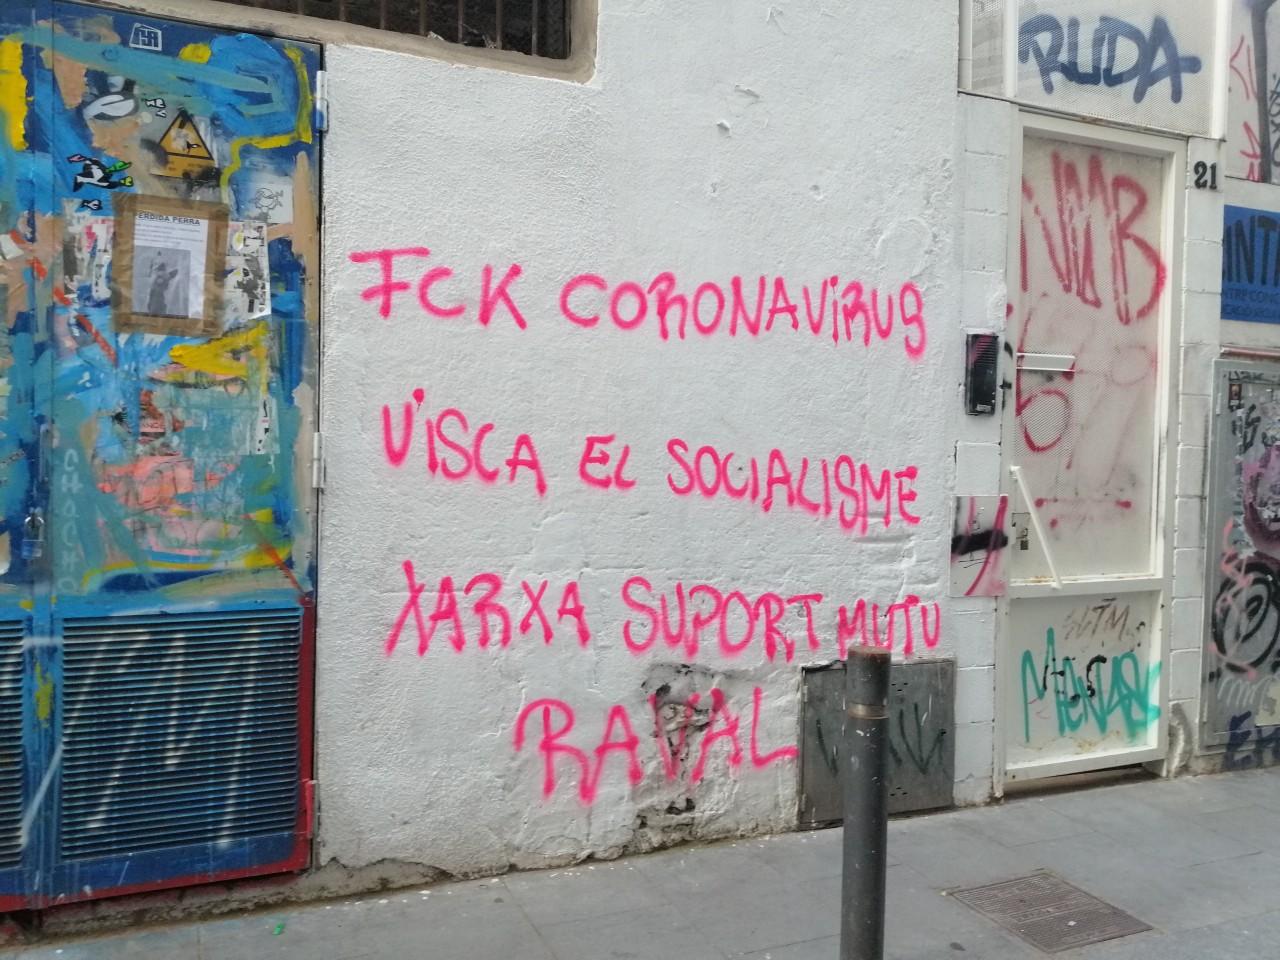 coronavirus missatge carrer socialisme xarxa suport mutu raval